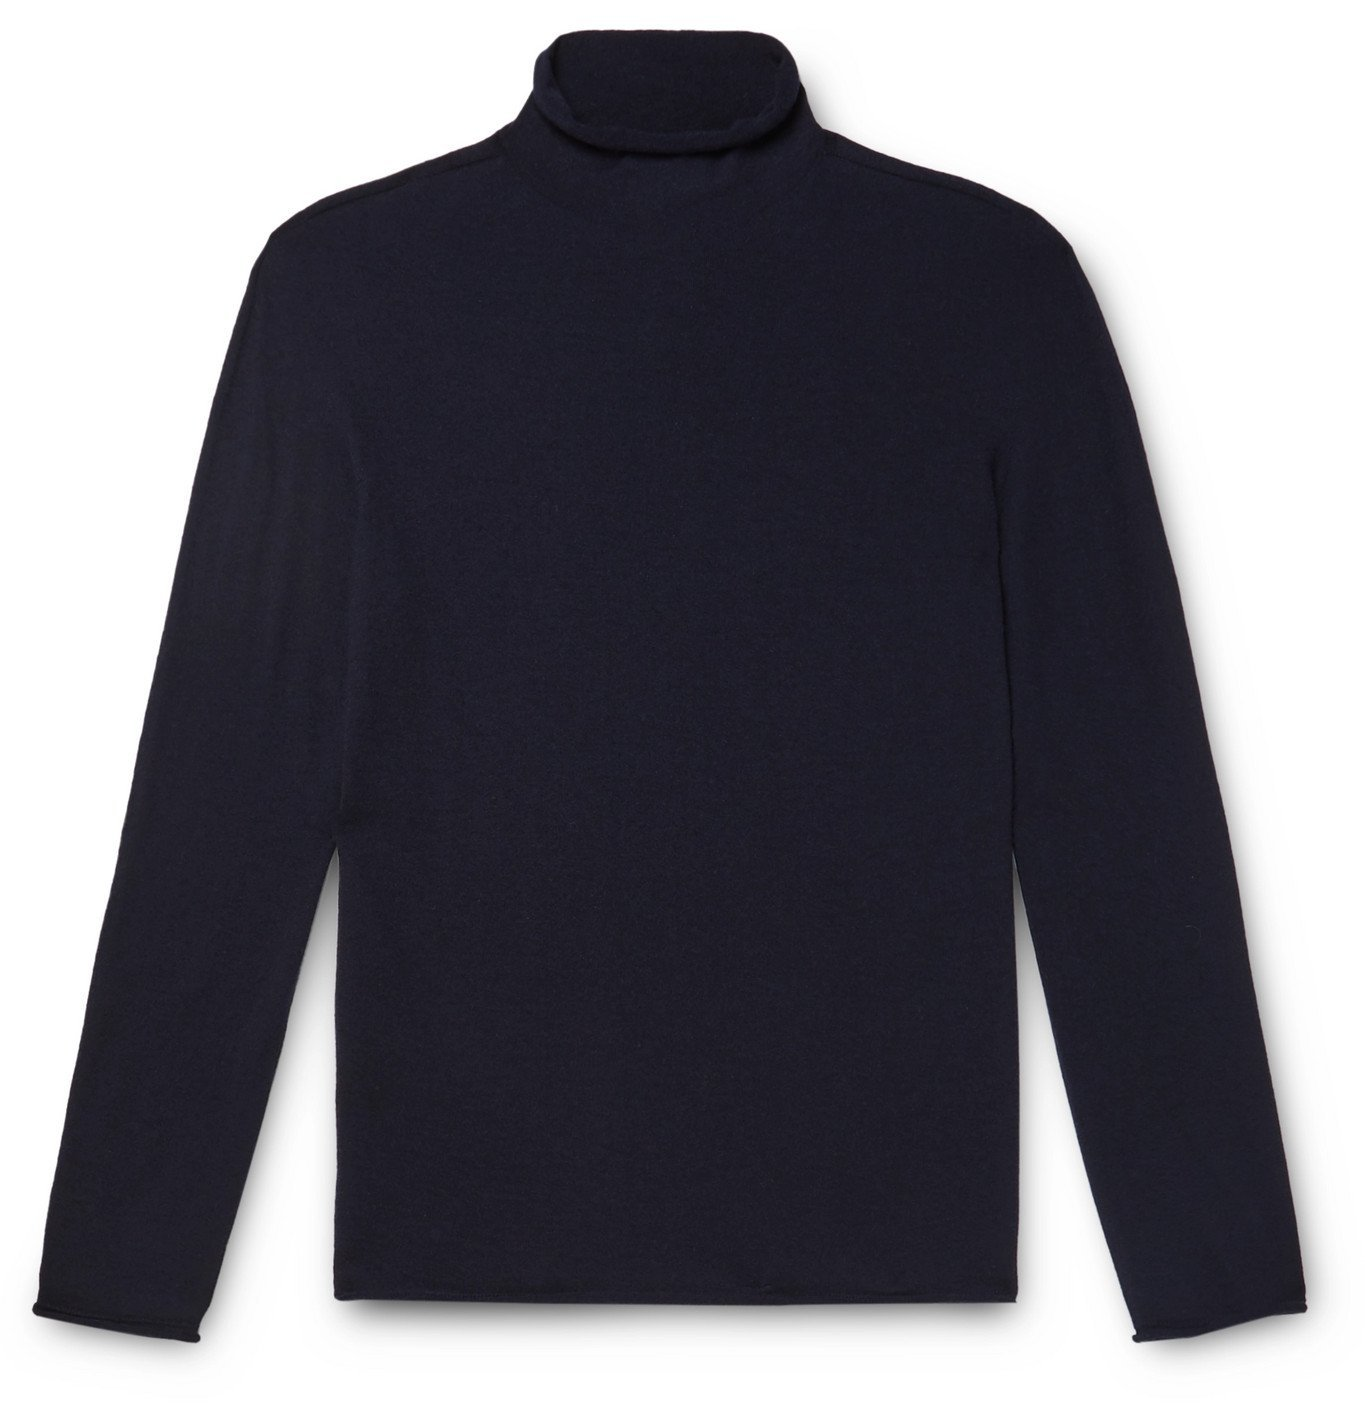 Giorgio Armani - Slim-Fit Cashmere-Blend Rollneck Sweater - Blue